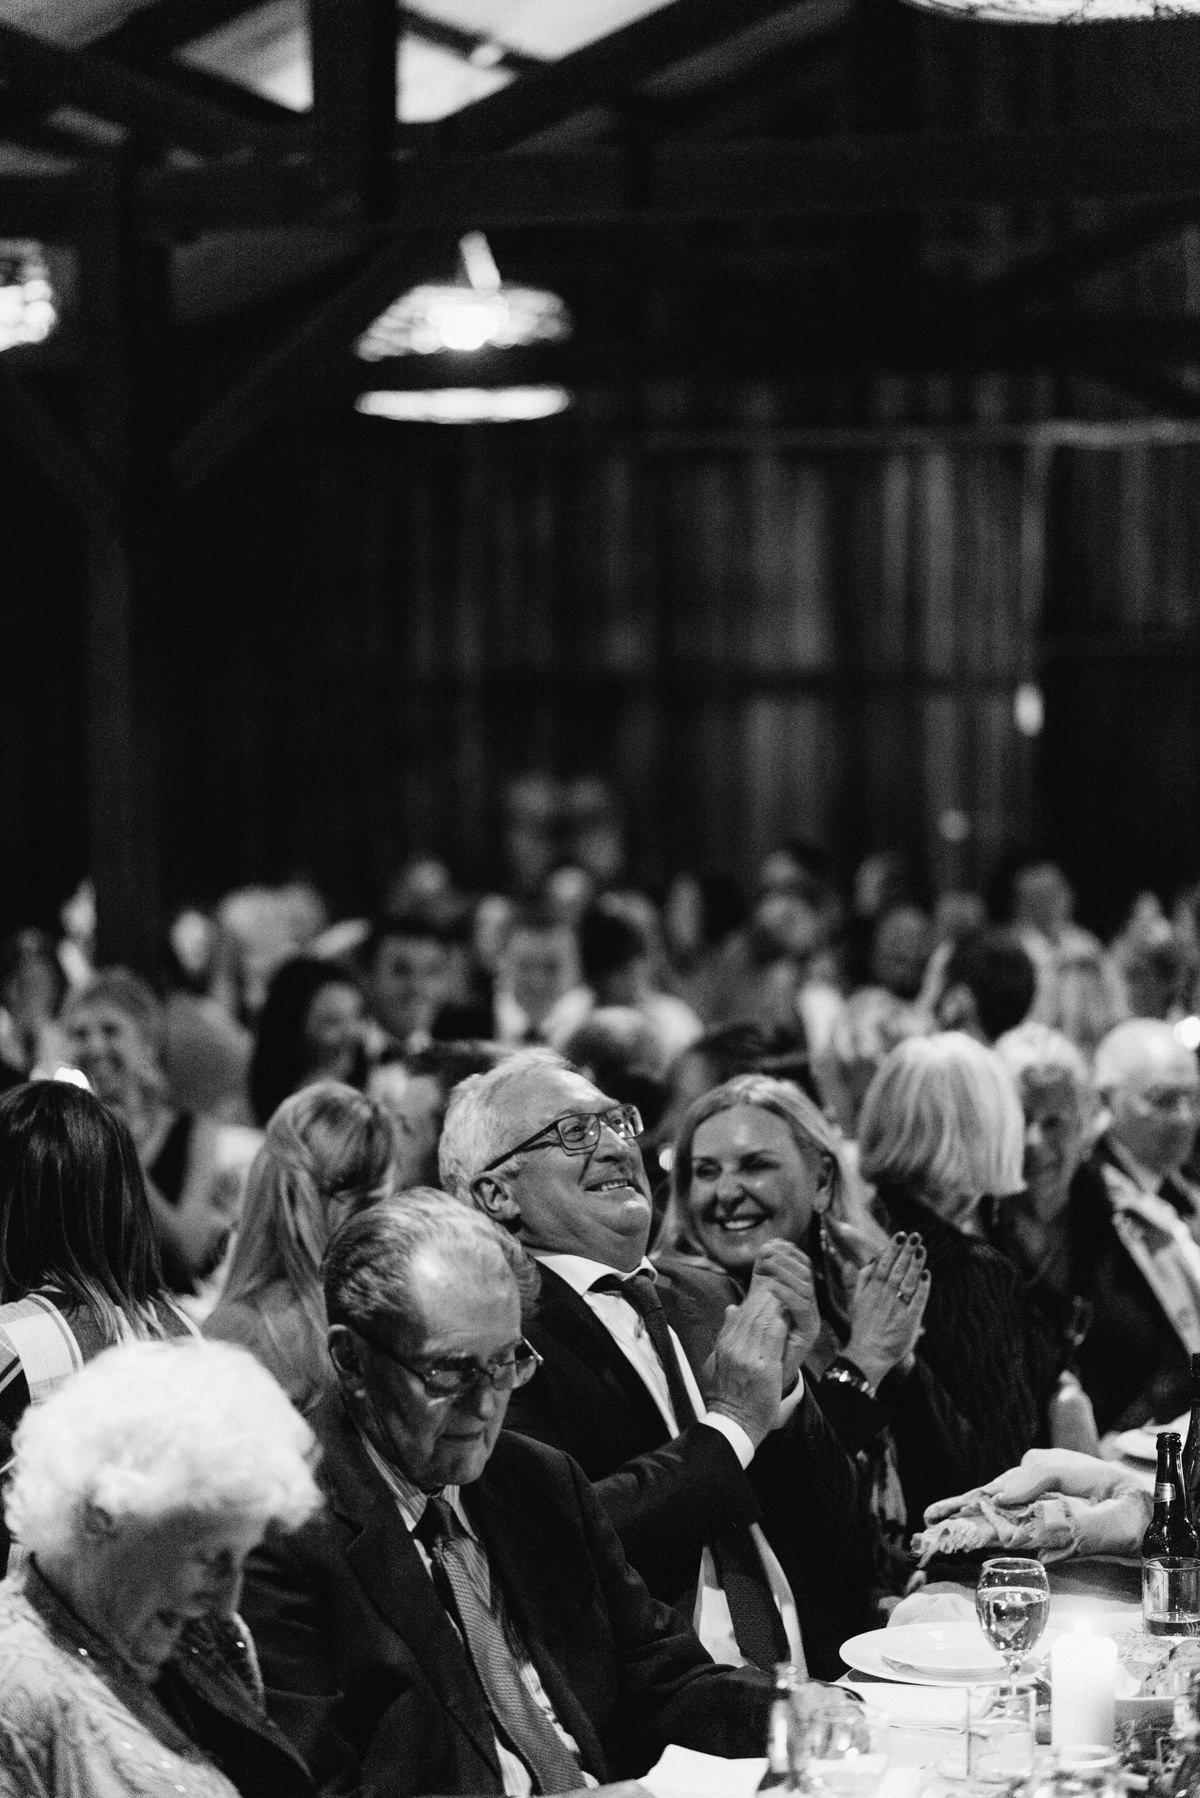 Wedding-Photohraphy-Launceston-Wines-For-Joanie-69.jpg